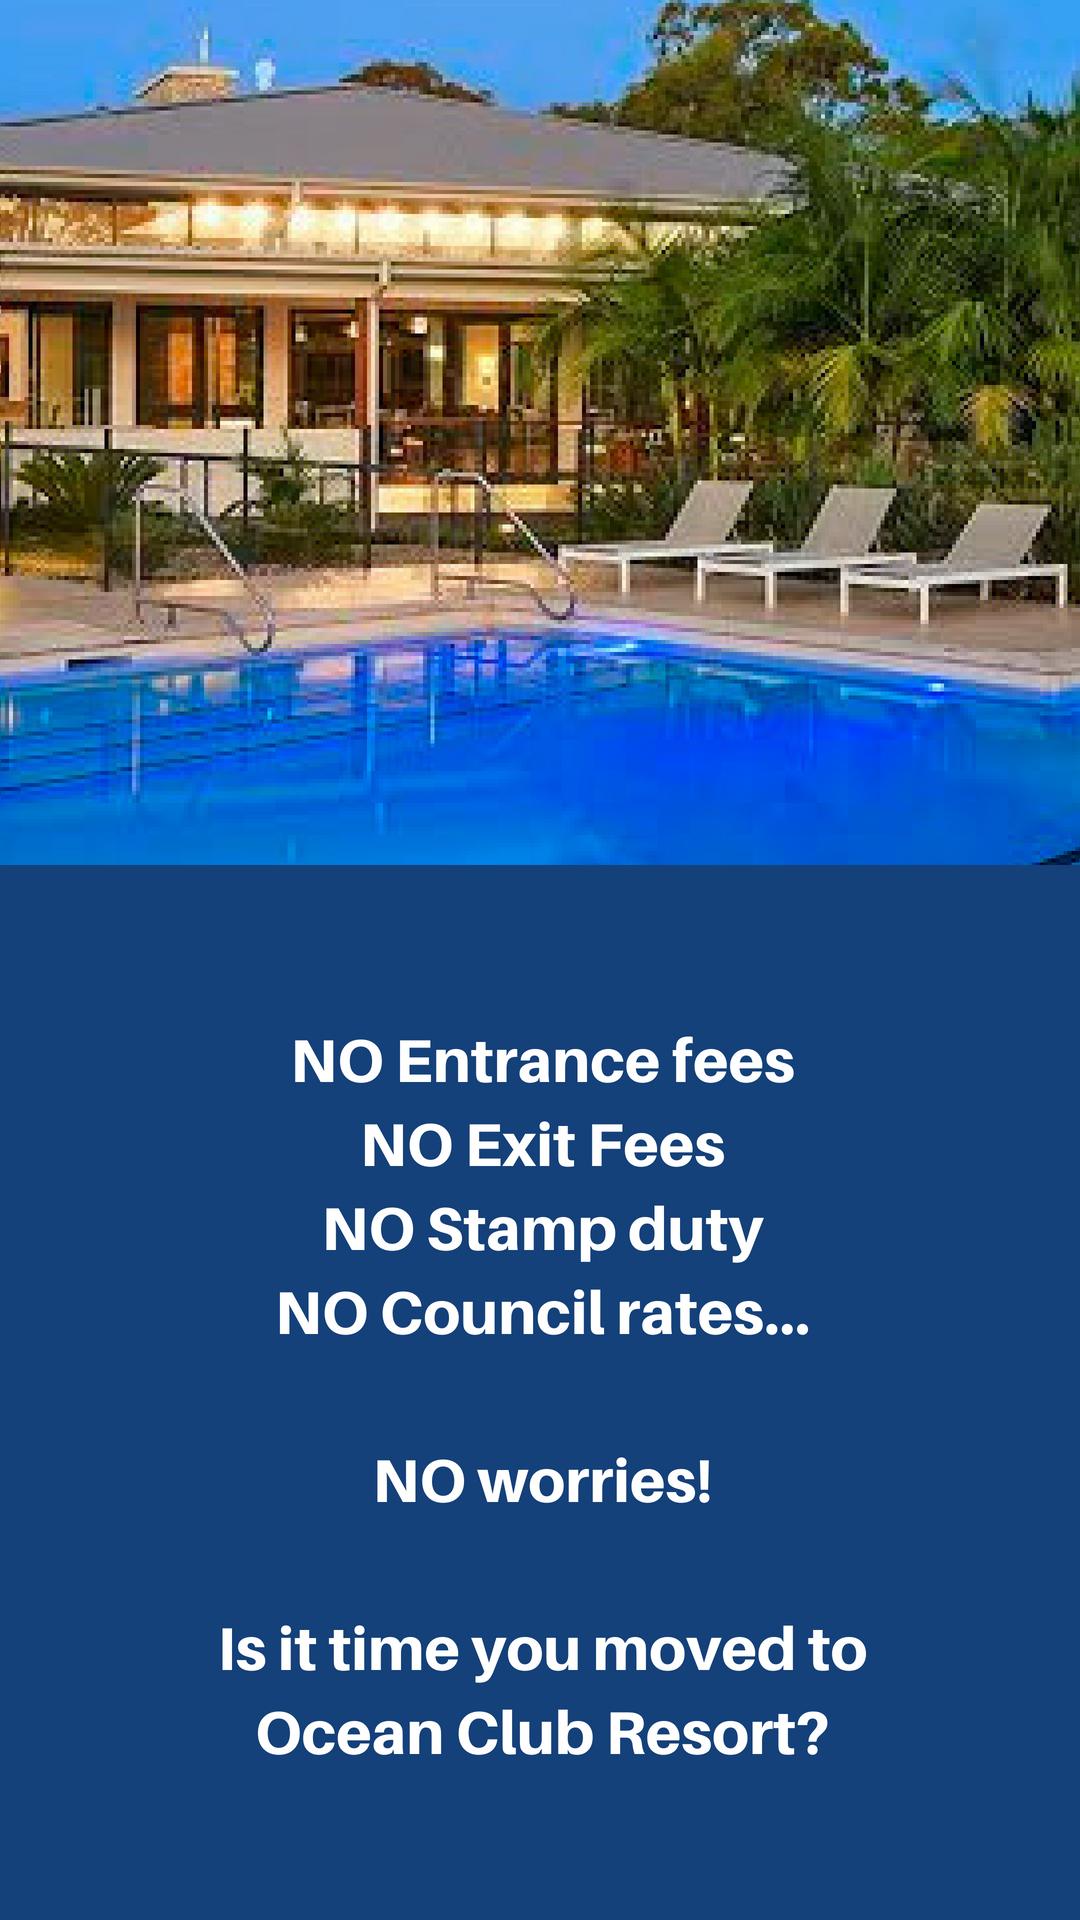 No entrance fees  No exit fees  No Stamp duty  No council